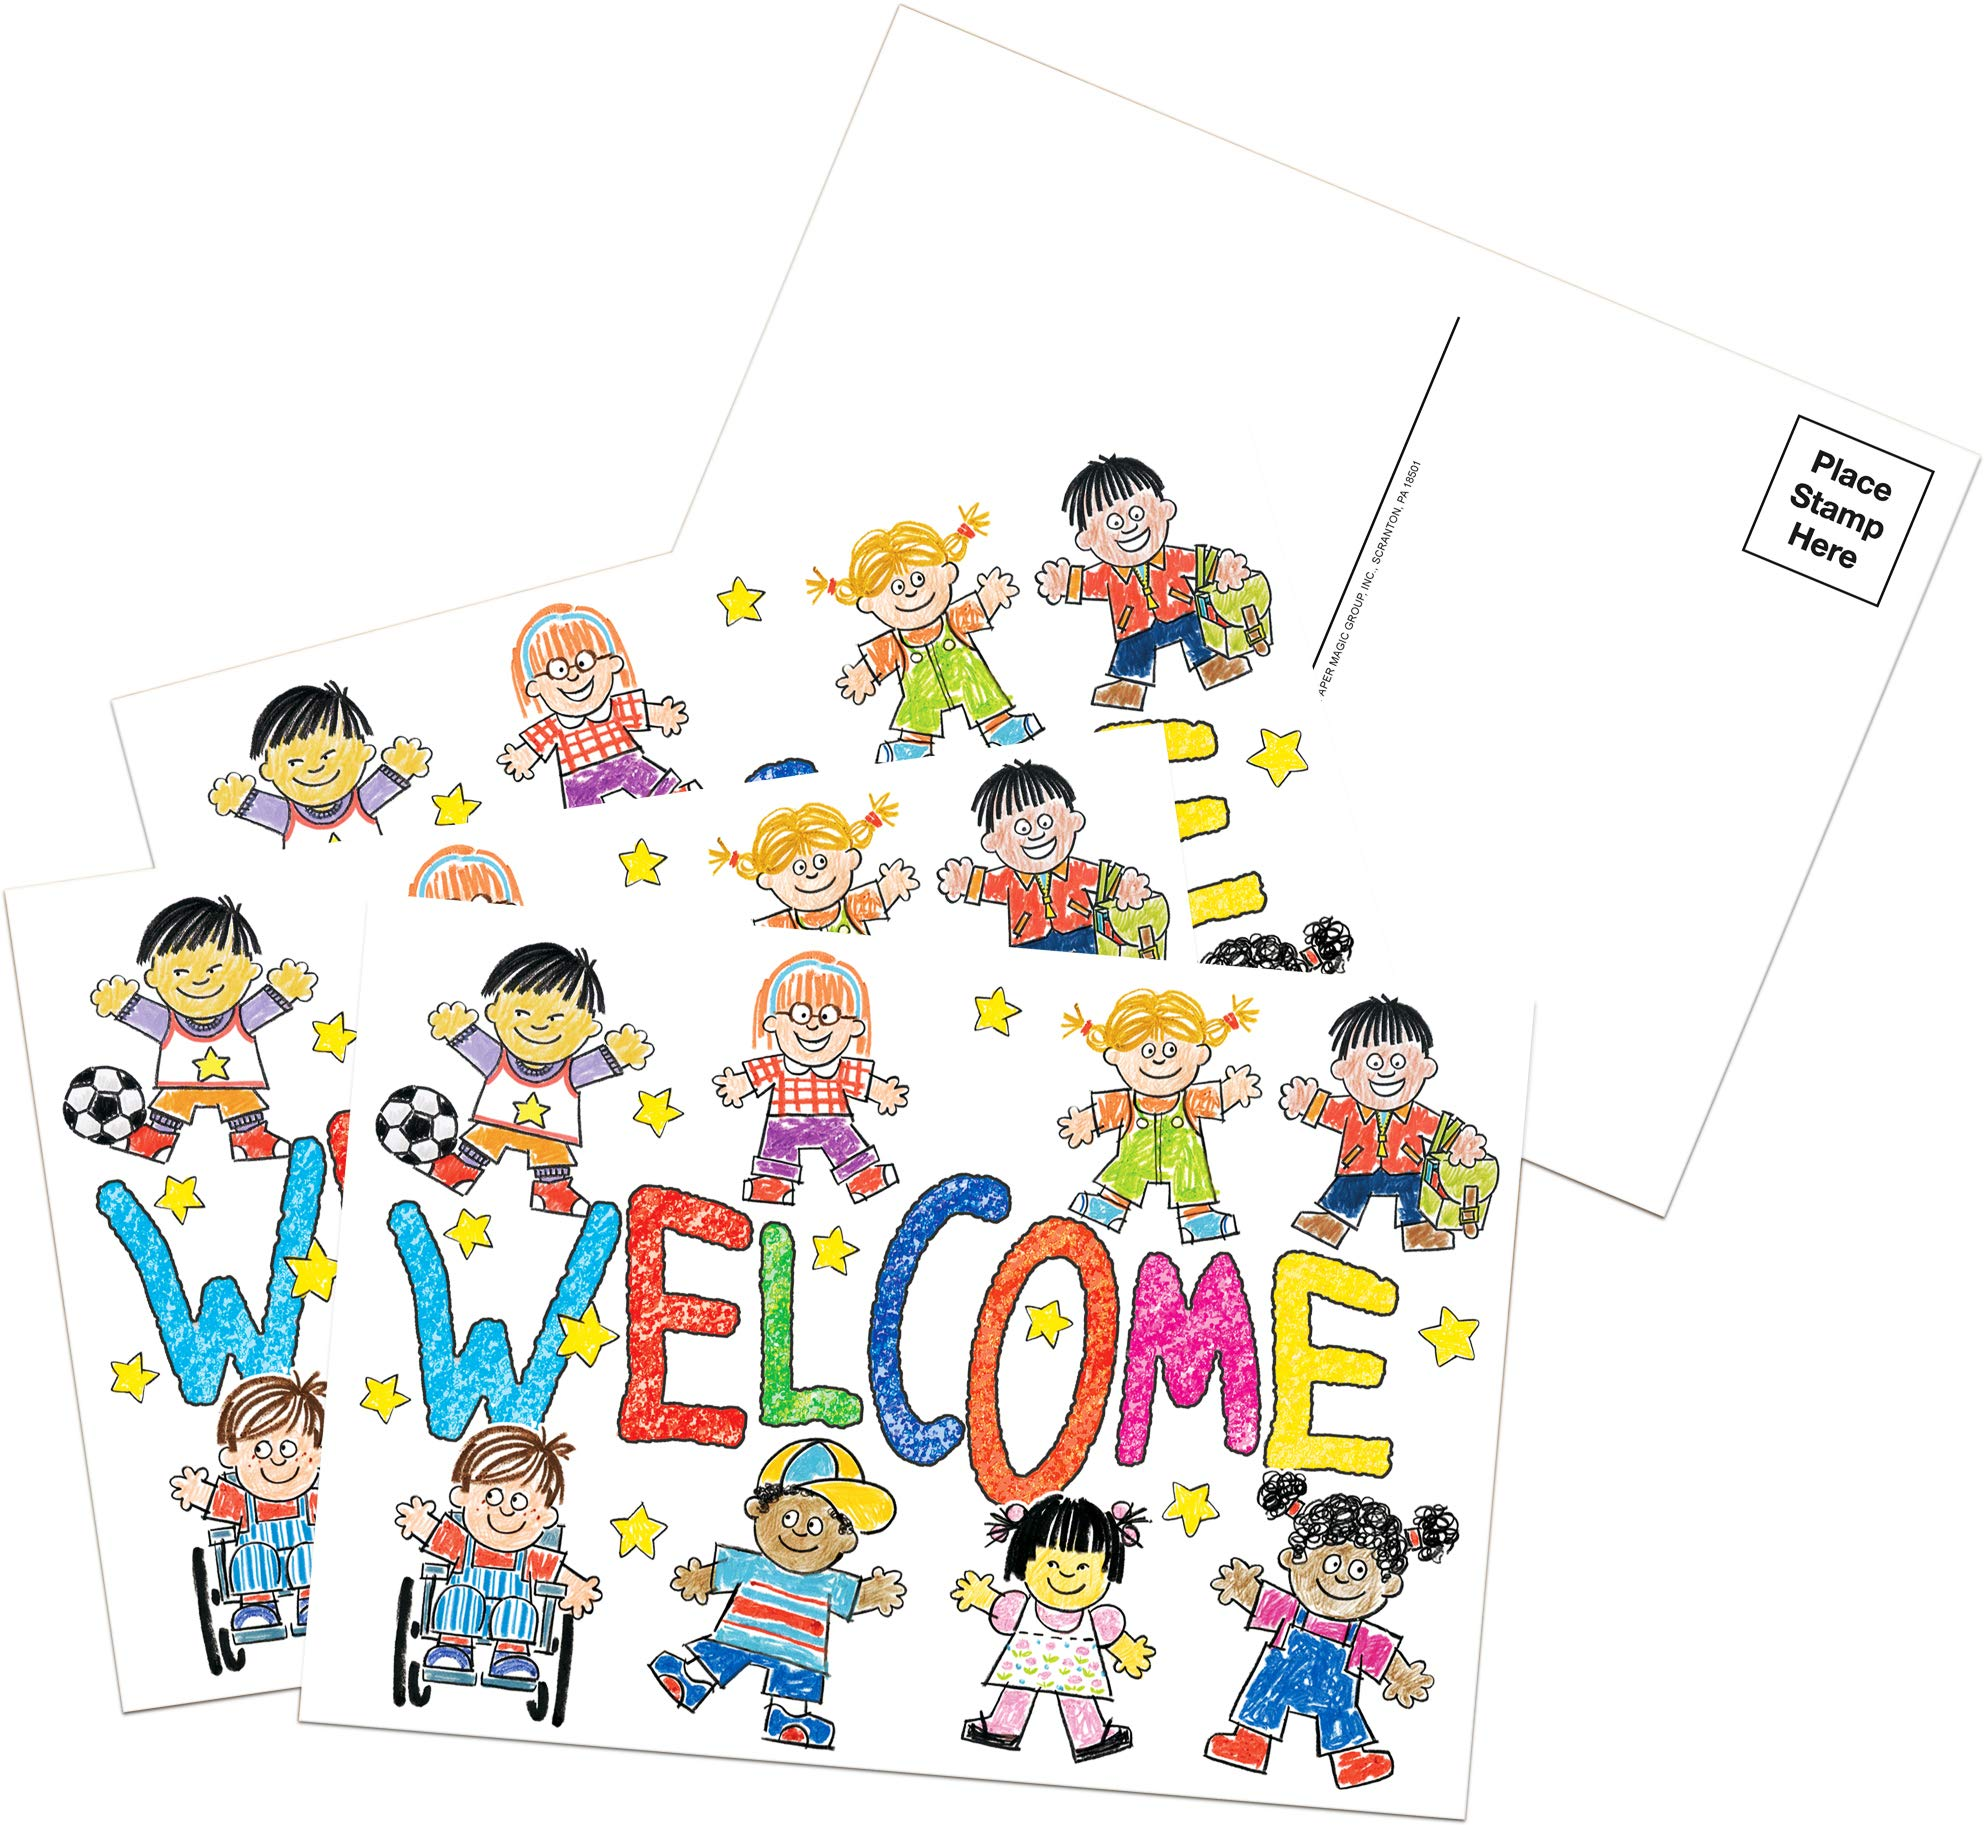 Eureka 'Welcome' Teacher Postcards for School Students, 36pc, 4'' W x 6'' L